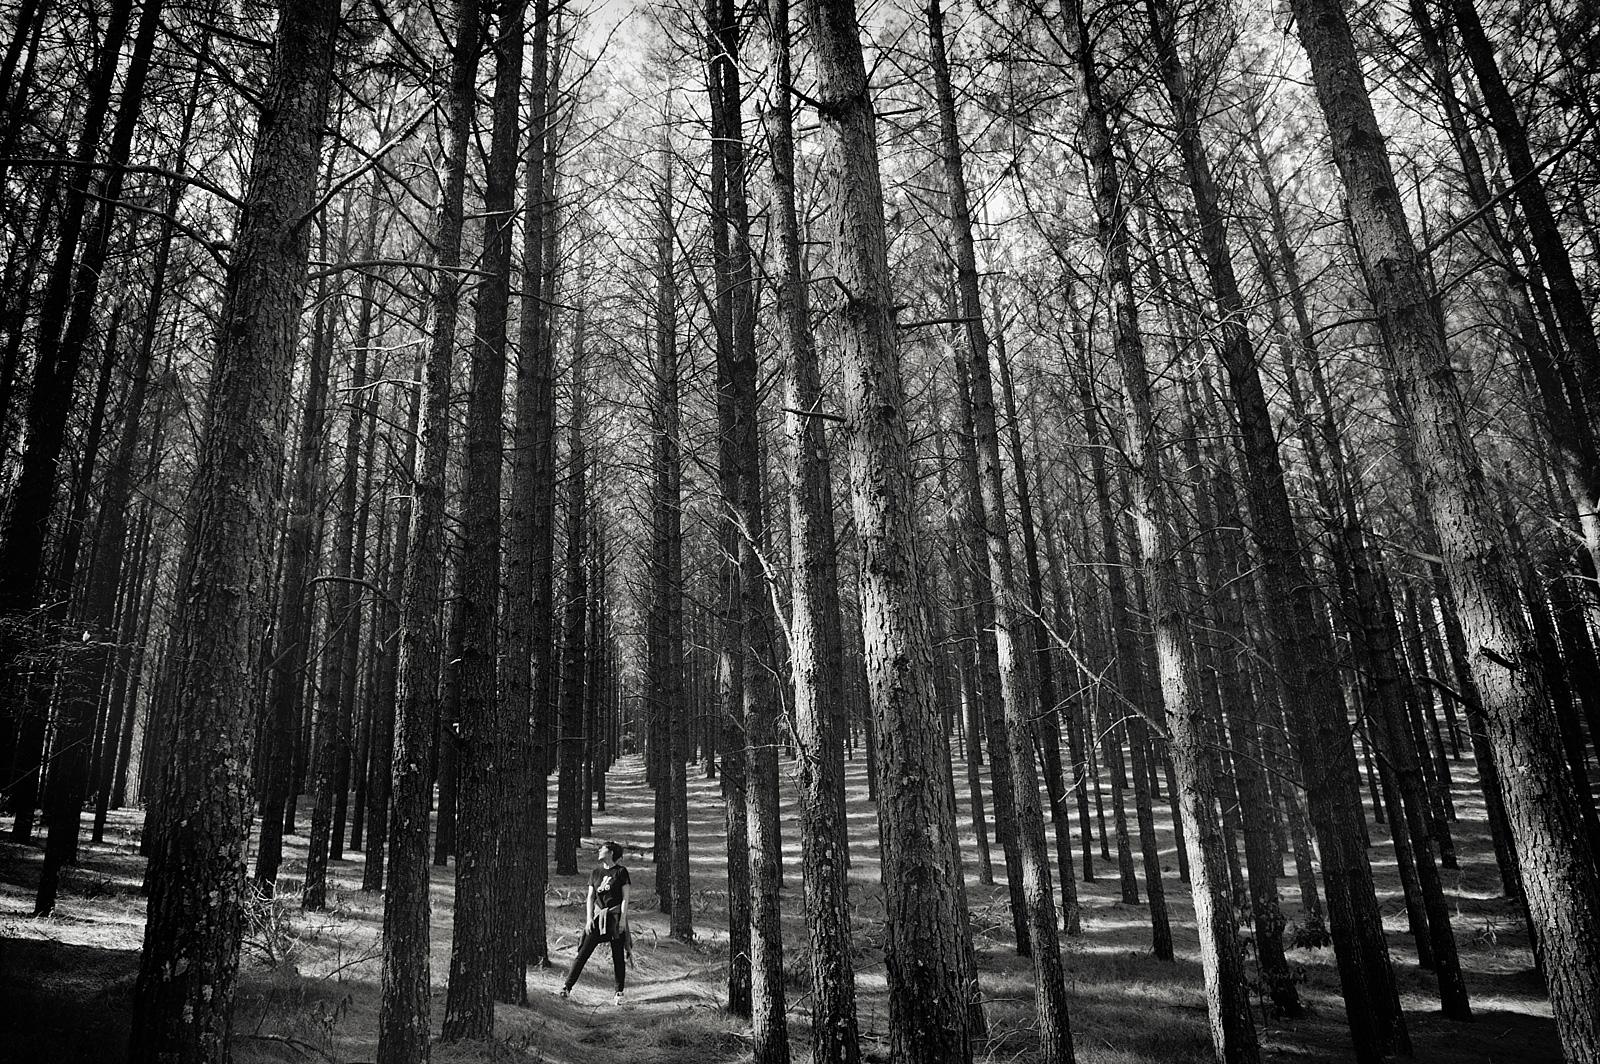 Sycamore-Avenue-Top-KZN-Photographer-Jacki-Bruniquel-01